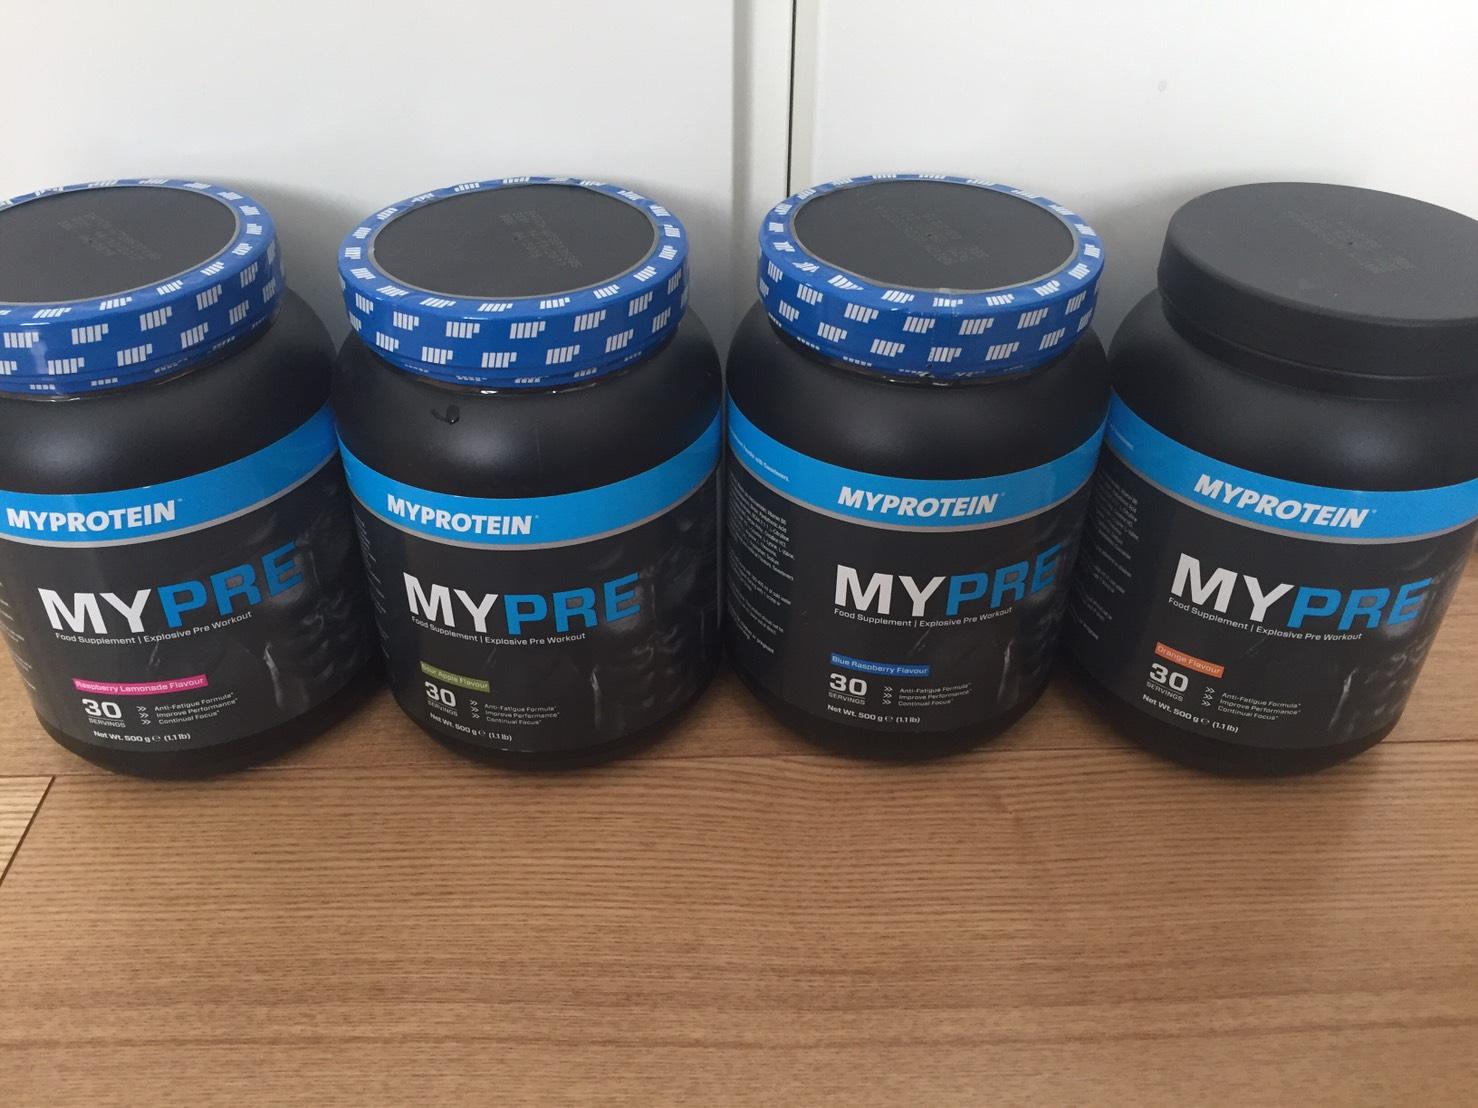 Mypre(マイプレ)の成分表